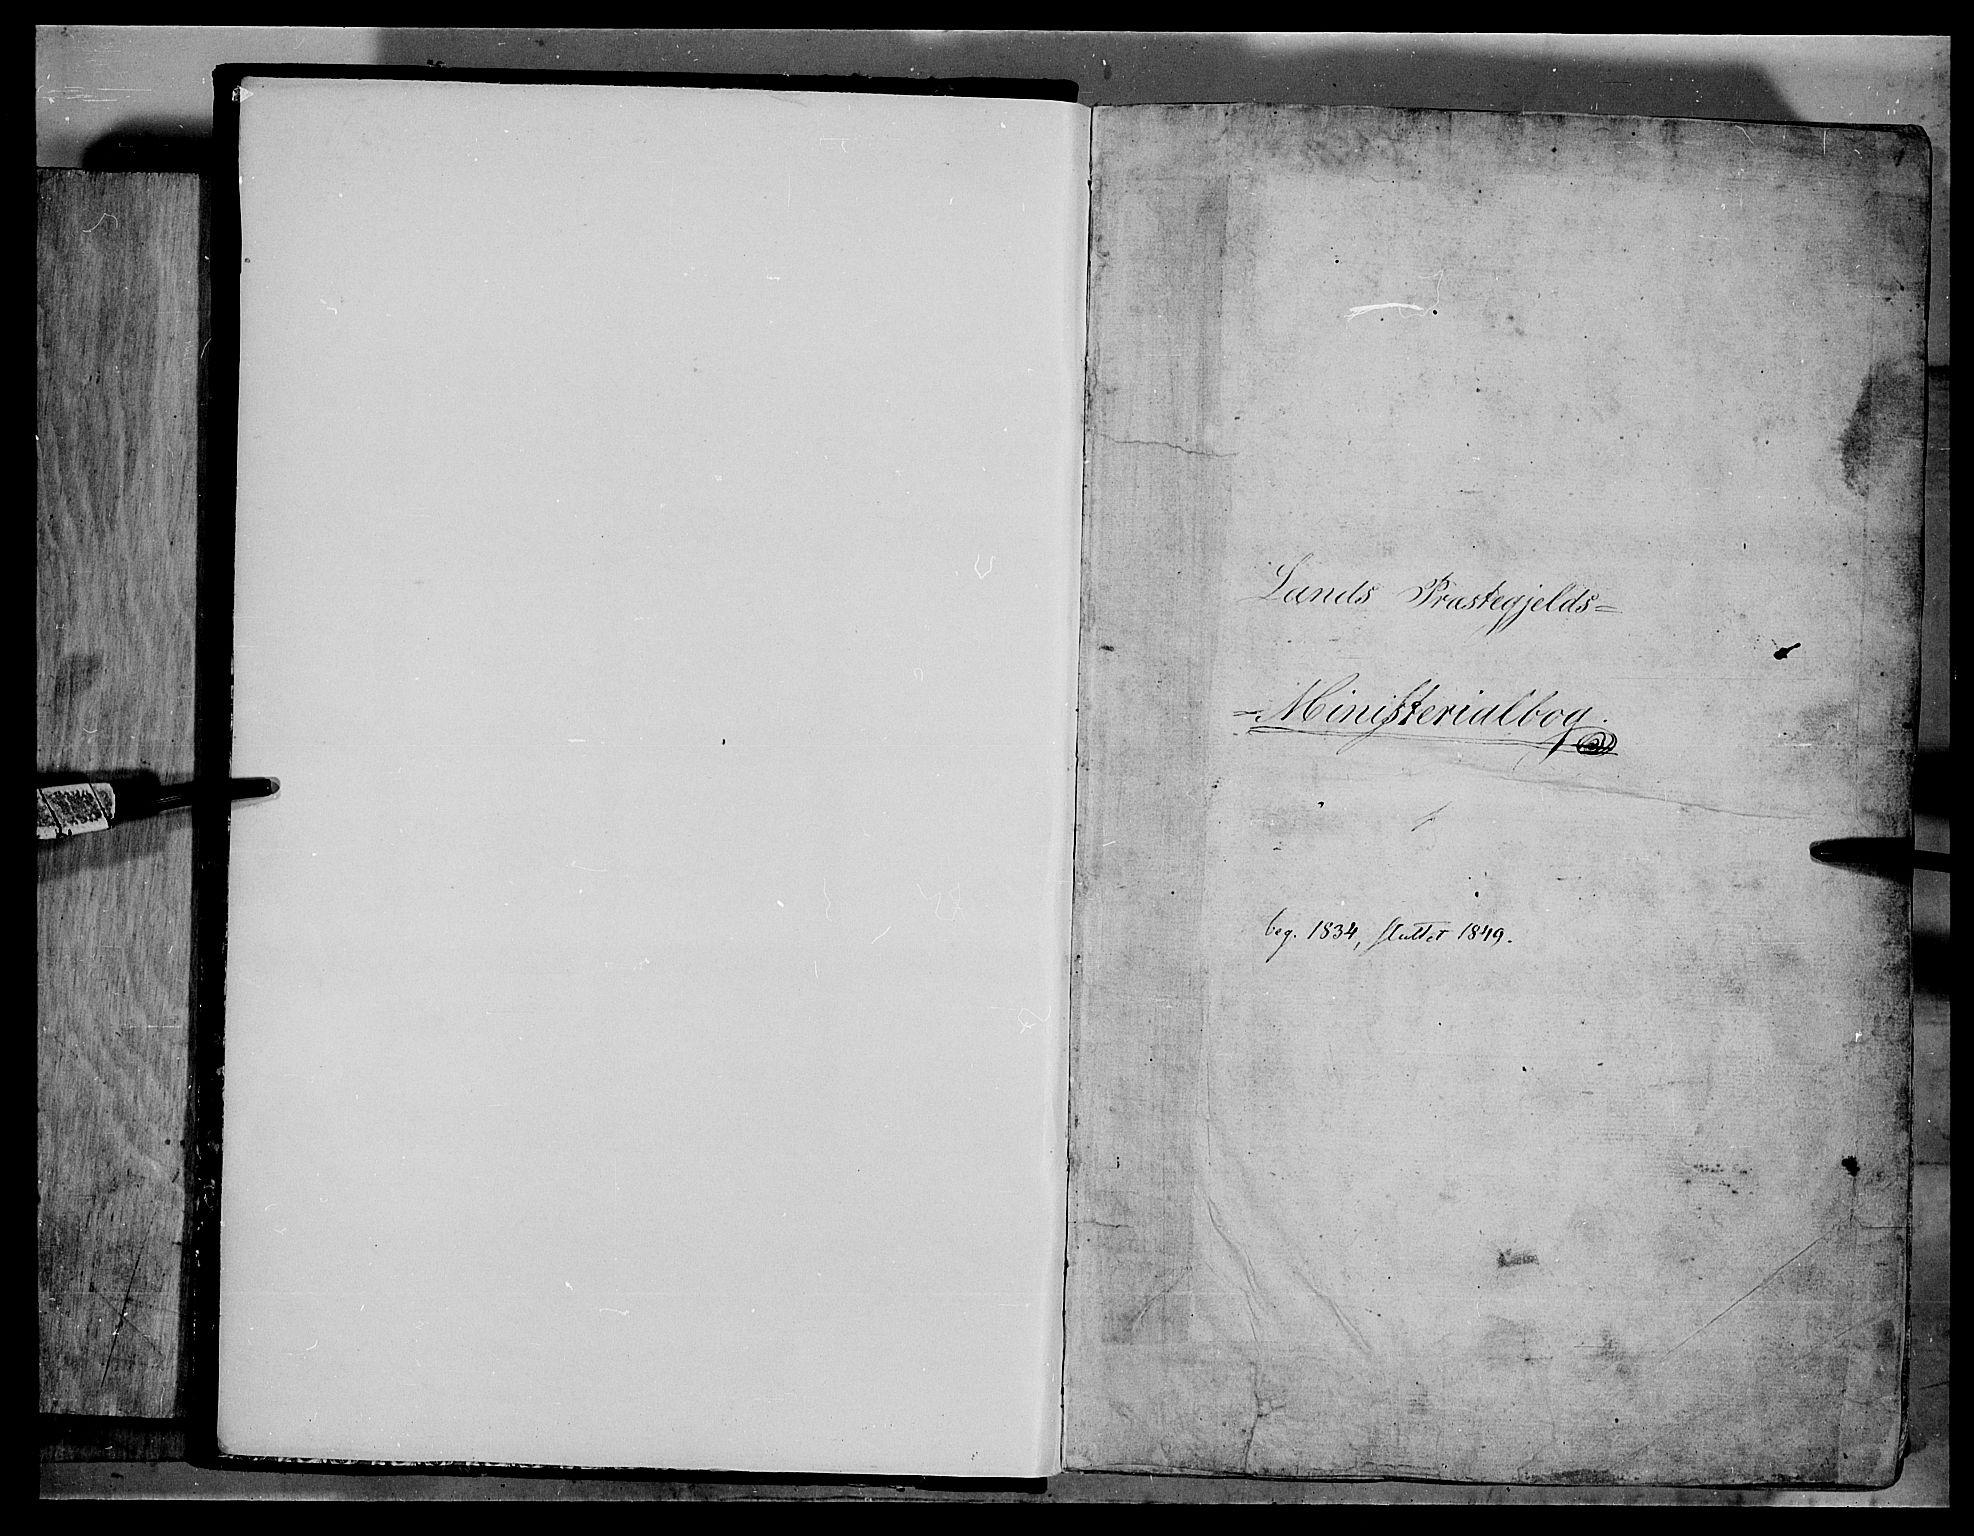 SAH, Land prestekontor, Klokkerbok nr. 2, 1833-1849